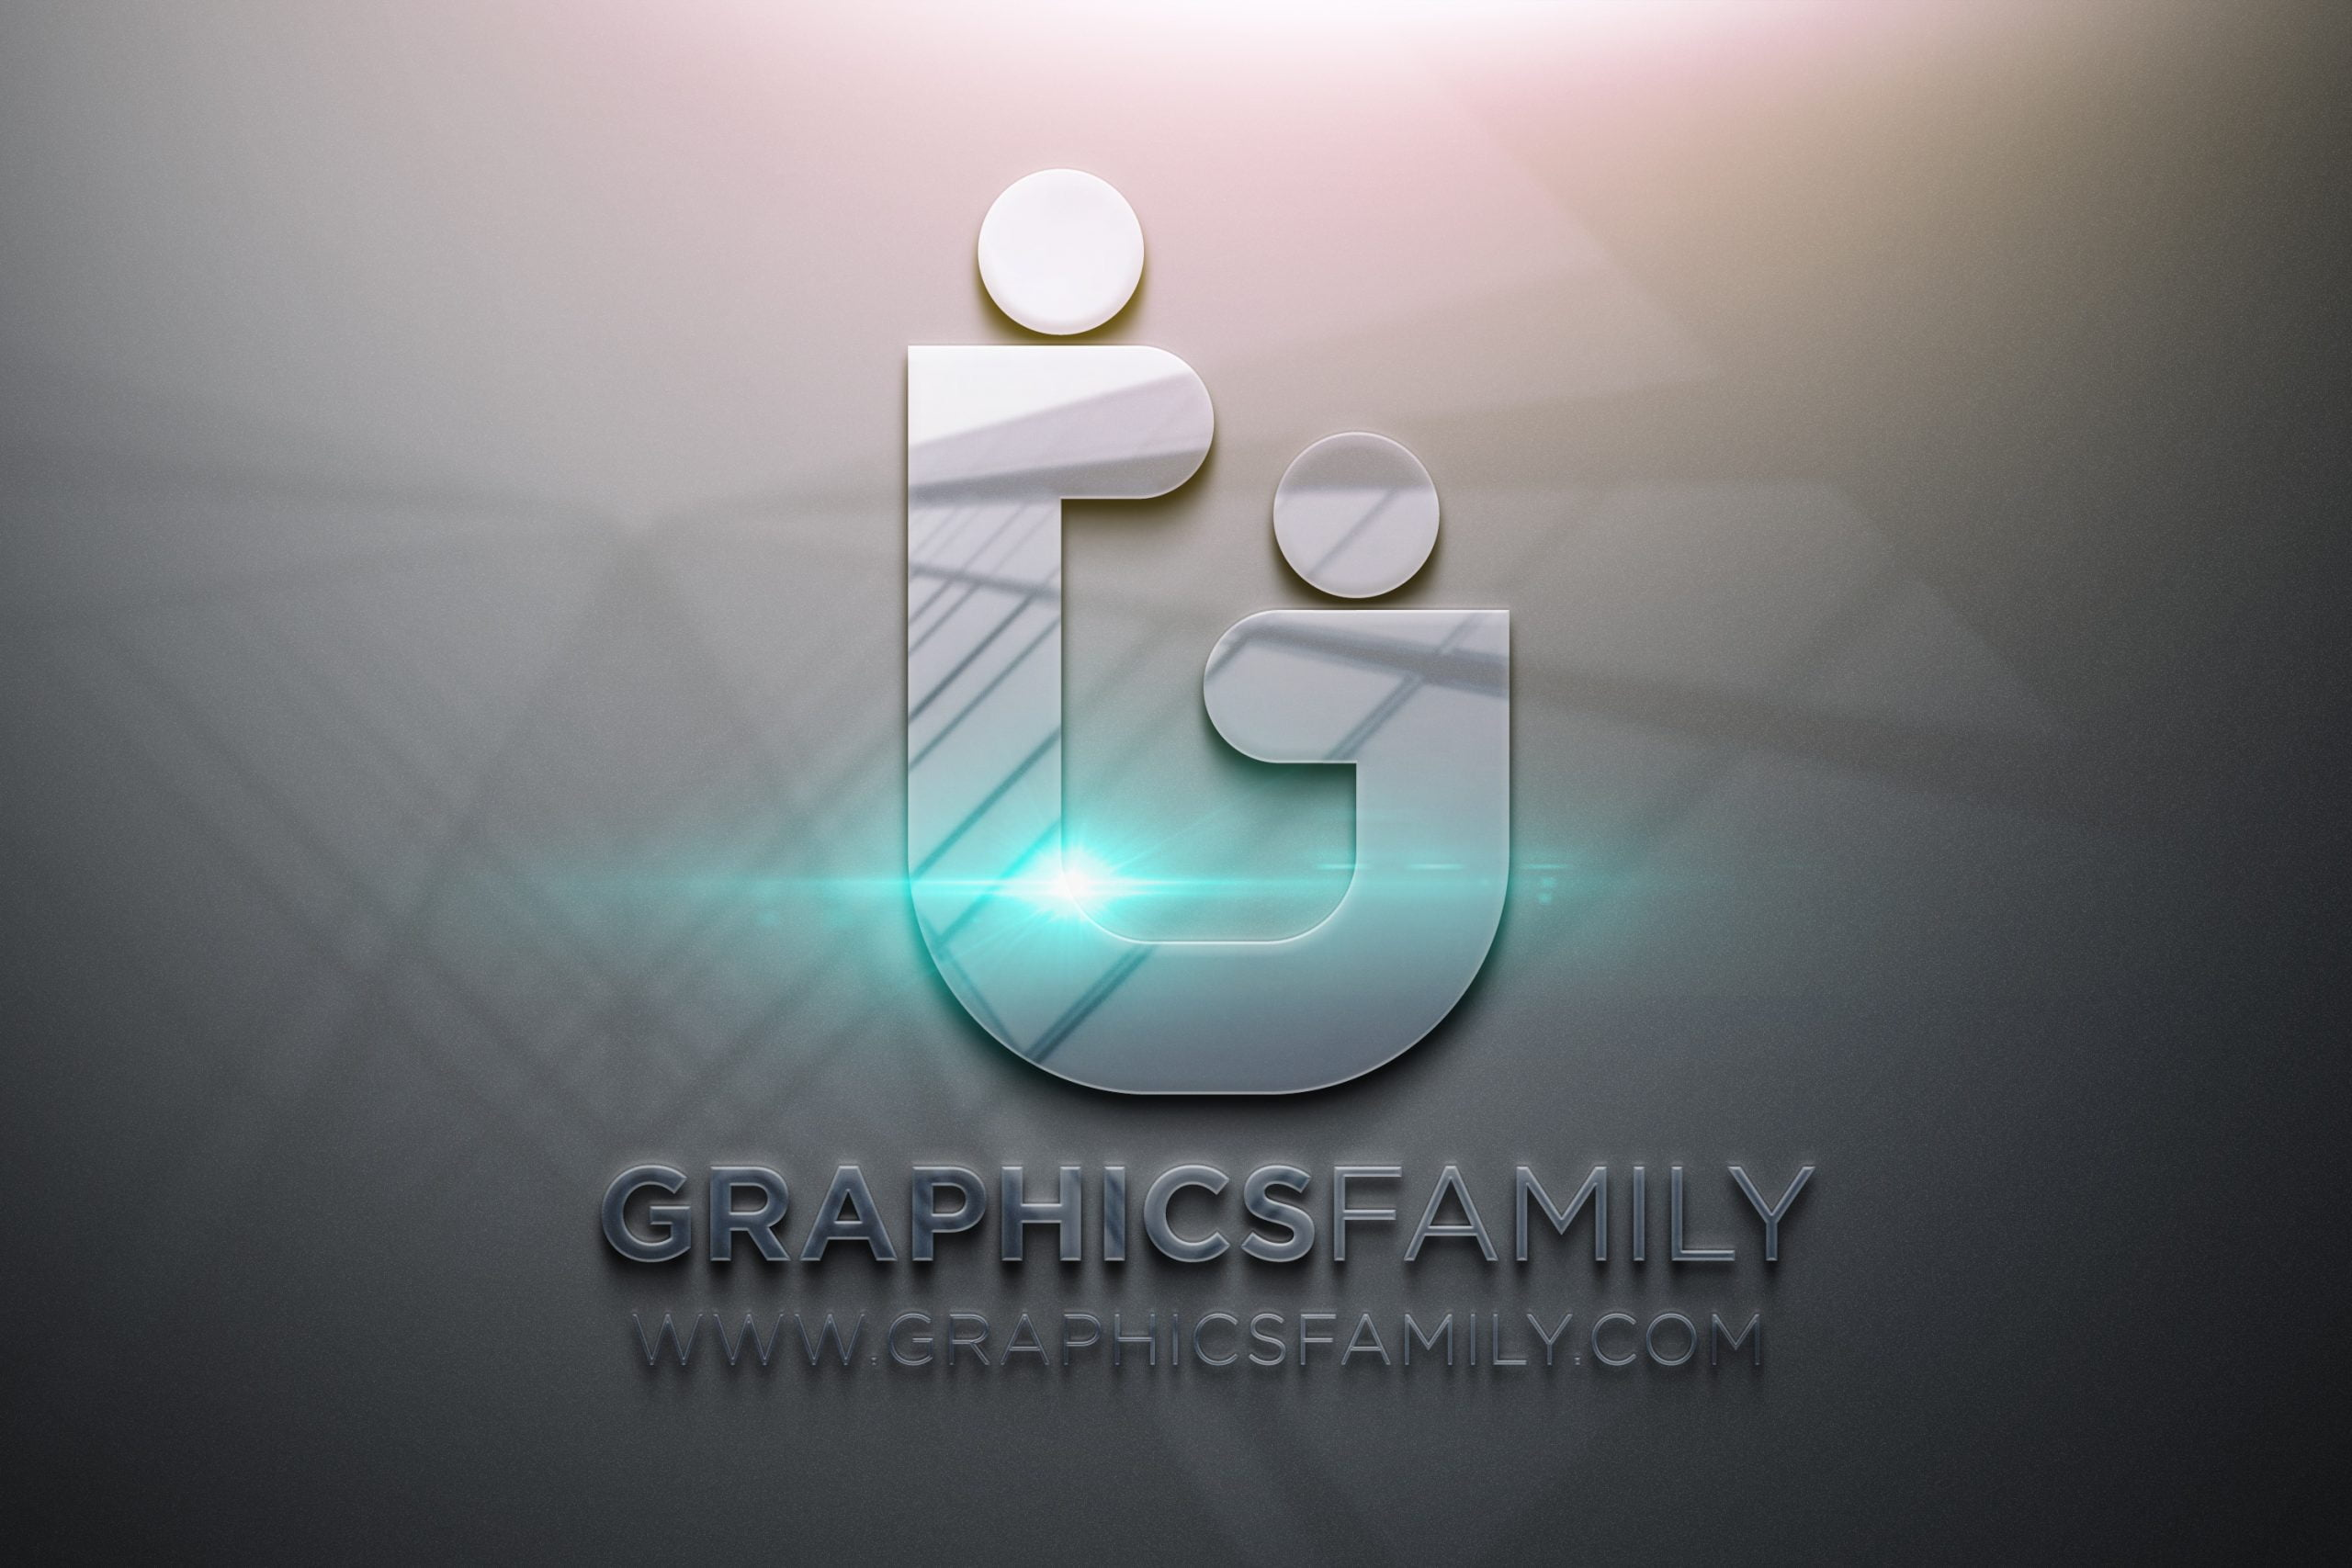 GraphicsFamily-Photoshop-Glossy-3D-Logo-Mockup